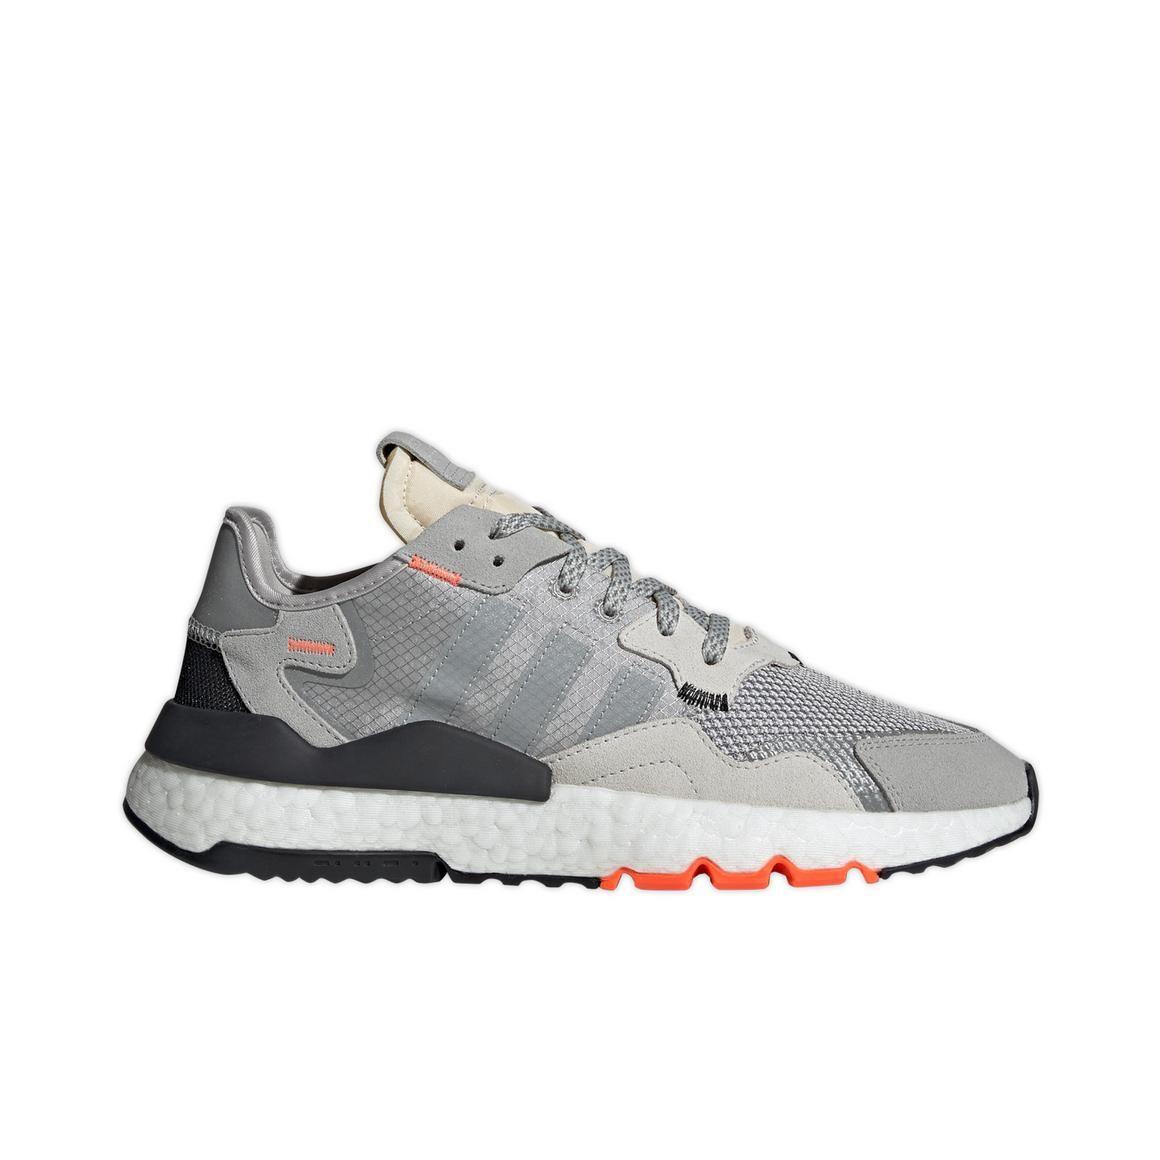 "adidas Nite Jogger ""Grey Two/Solar Orange"" Men's Shoe"